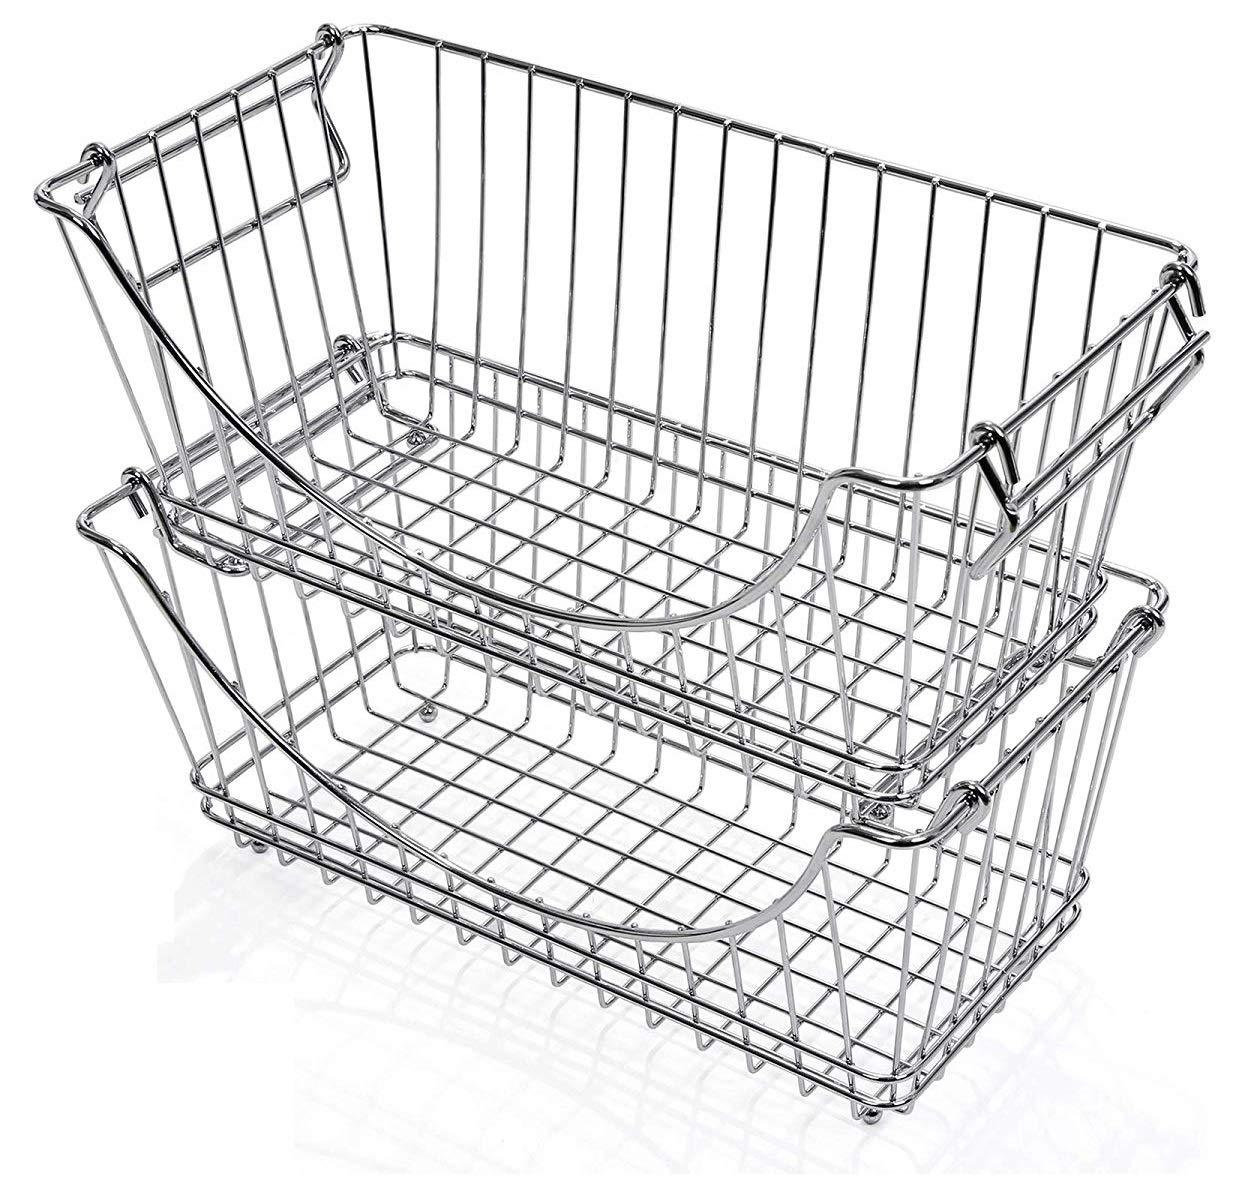 Smart Design Stacking Baskets Organizer w/Handle - Medium - Steel Metal - Food, Fruit, Vegetable Safe - Kitchen (12.63 x 5.5 Inch) [Chrome] (2 Pack) by Smart Design